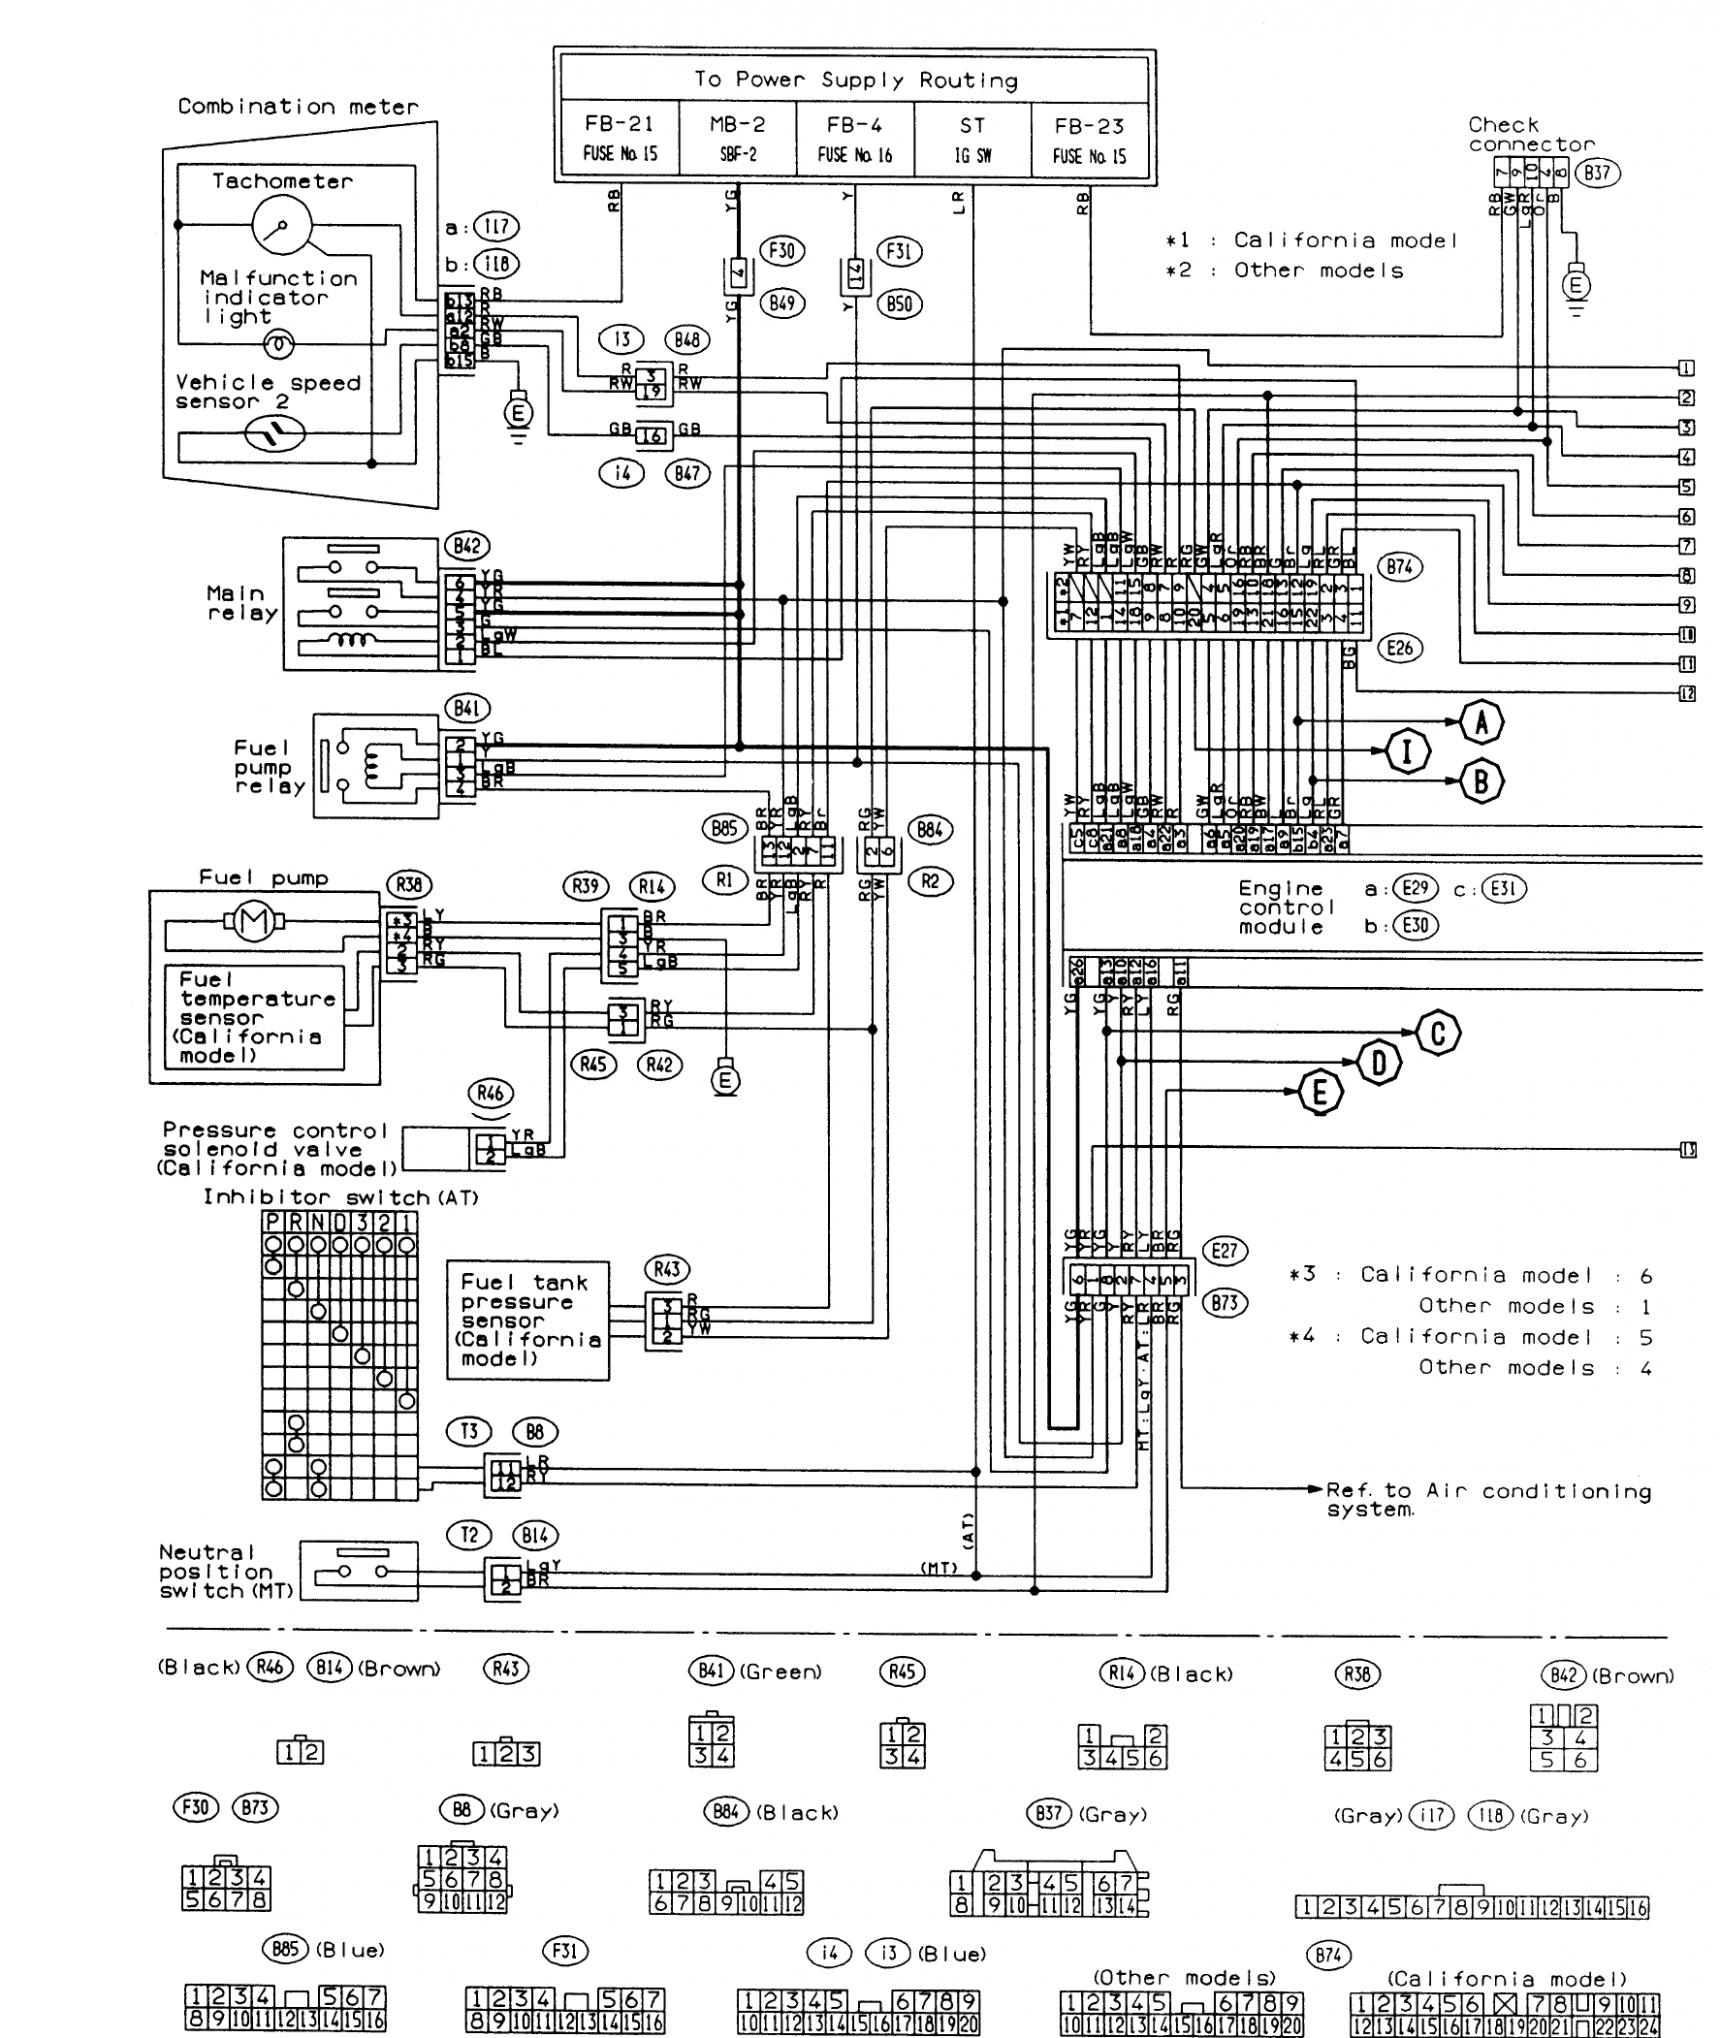 7 Subaru Impreza Engine Diagram 7 Subaru Impreza Engine